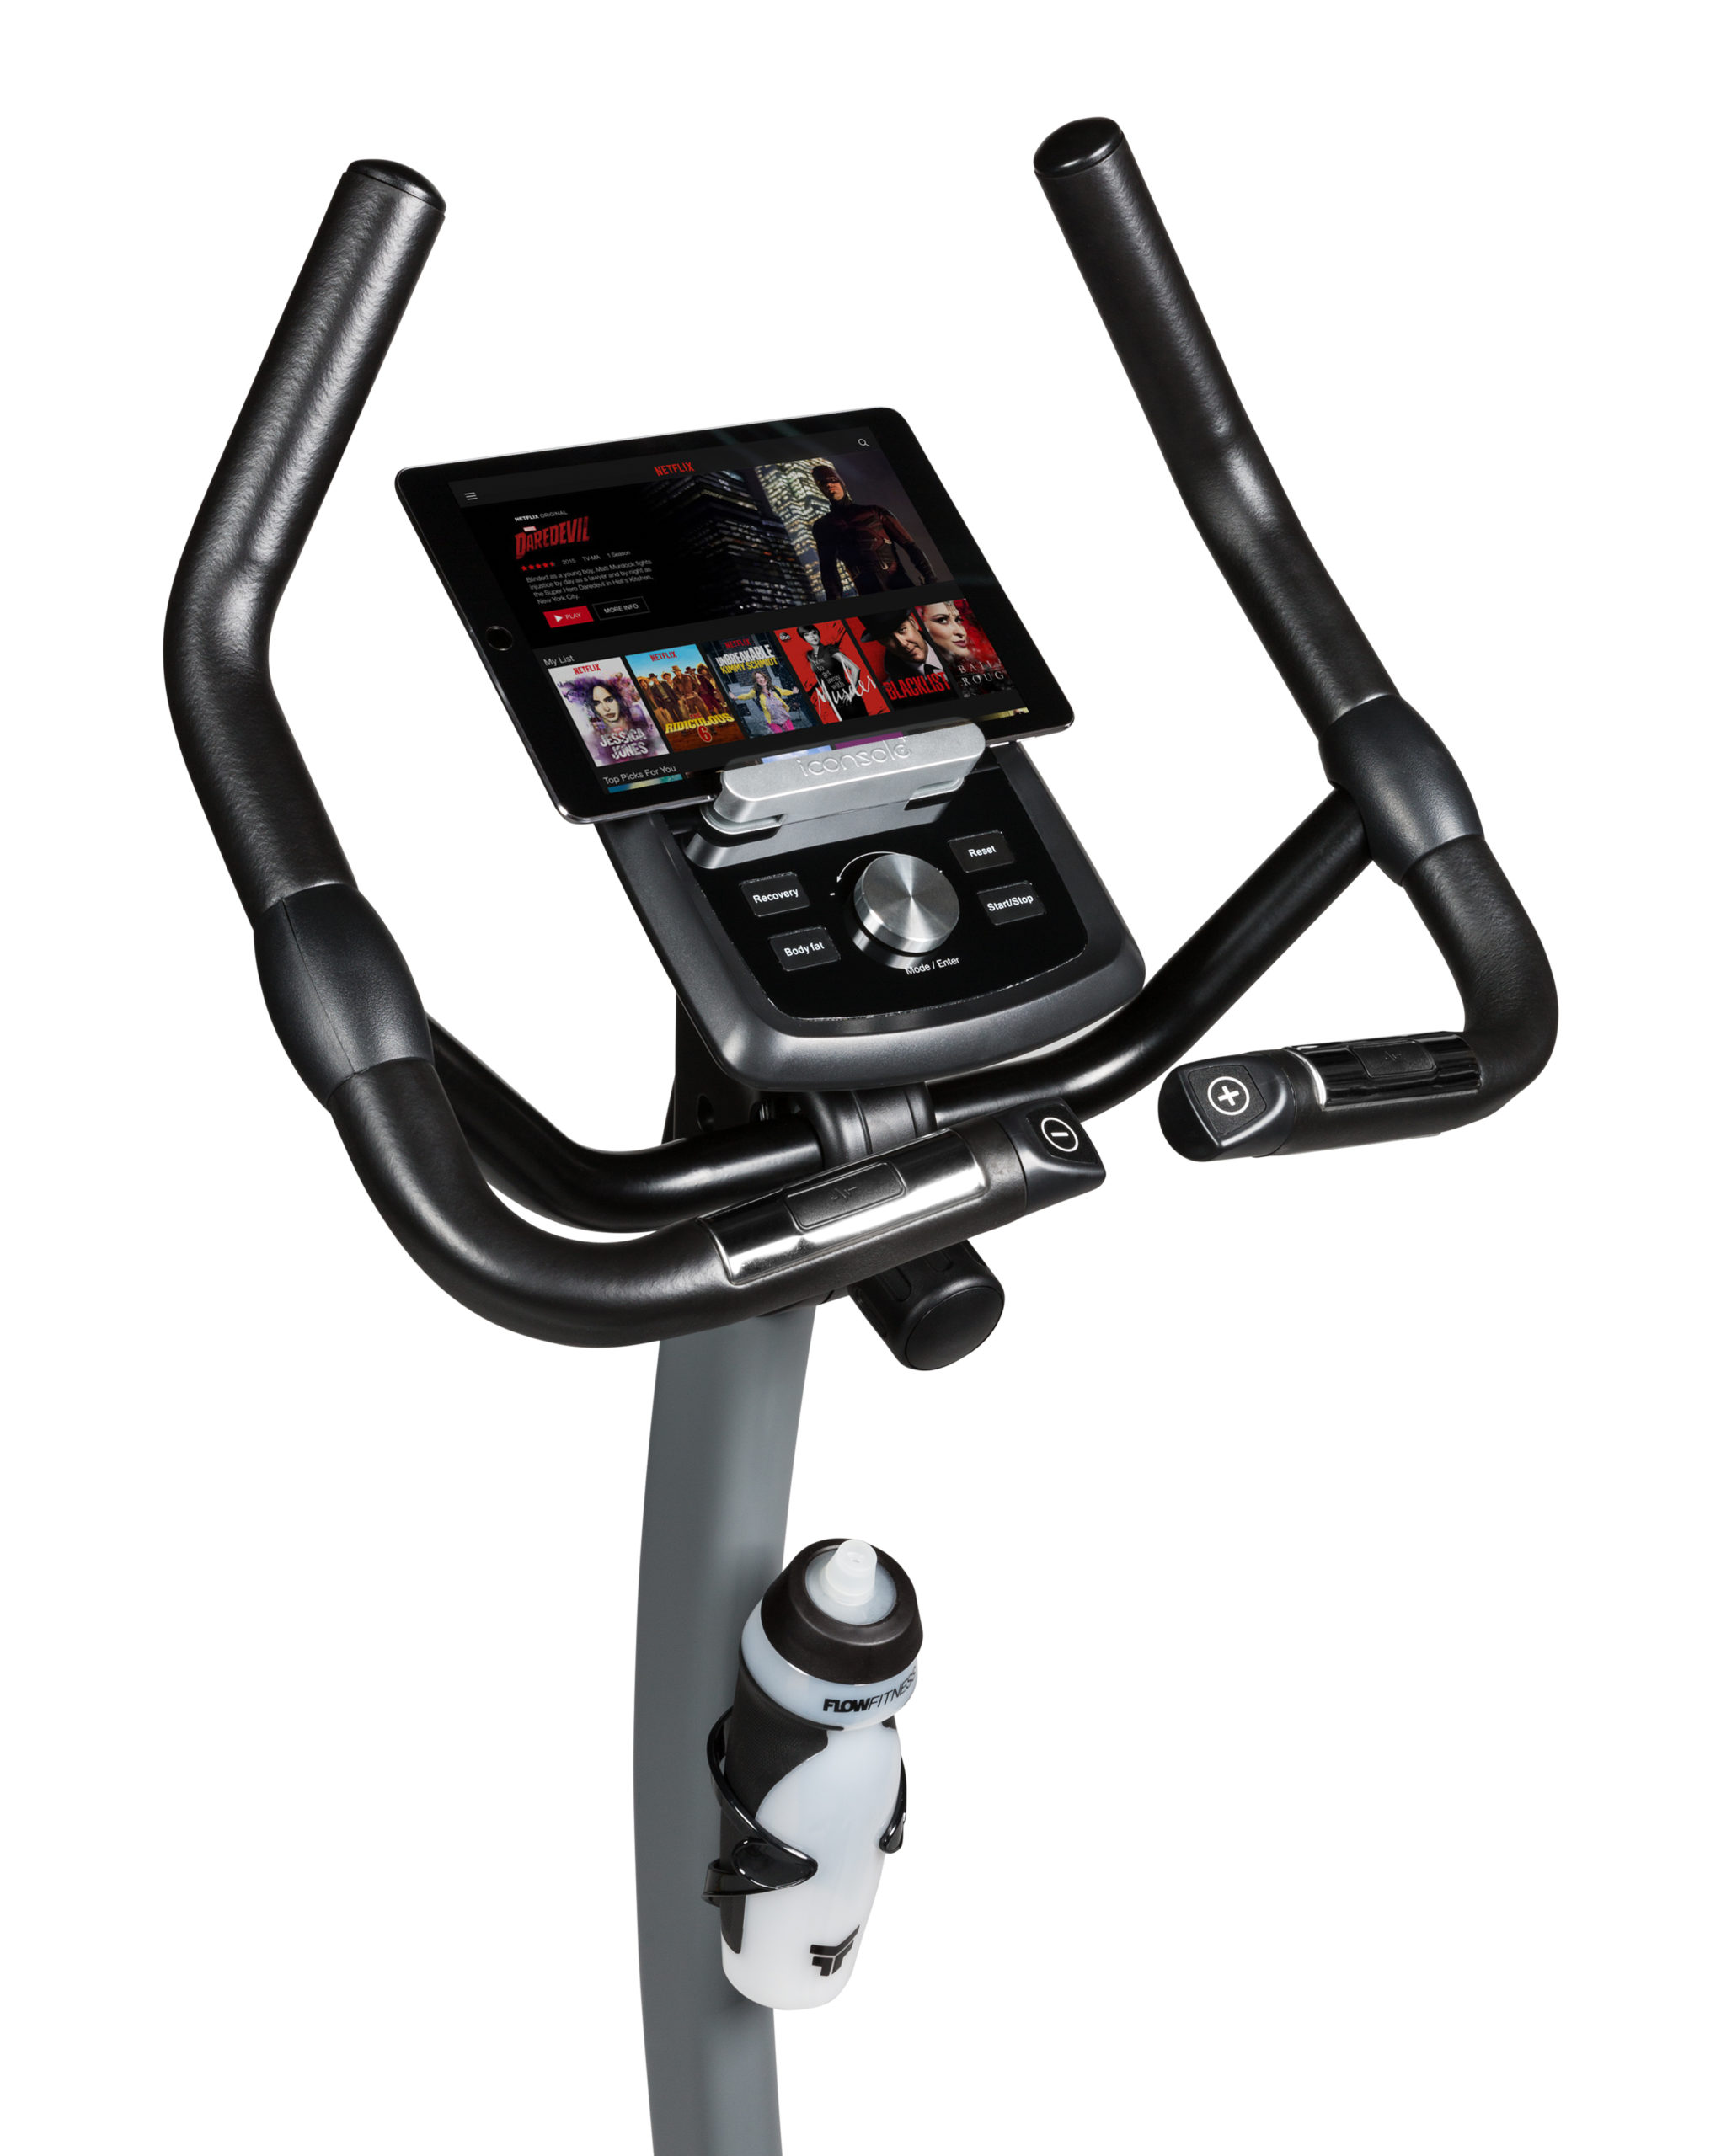 Flow Fitness Tabel Turner DHT2500i Hometrainer 9